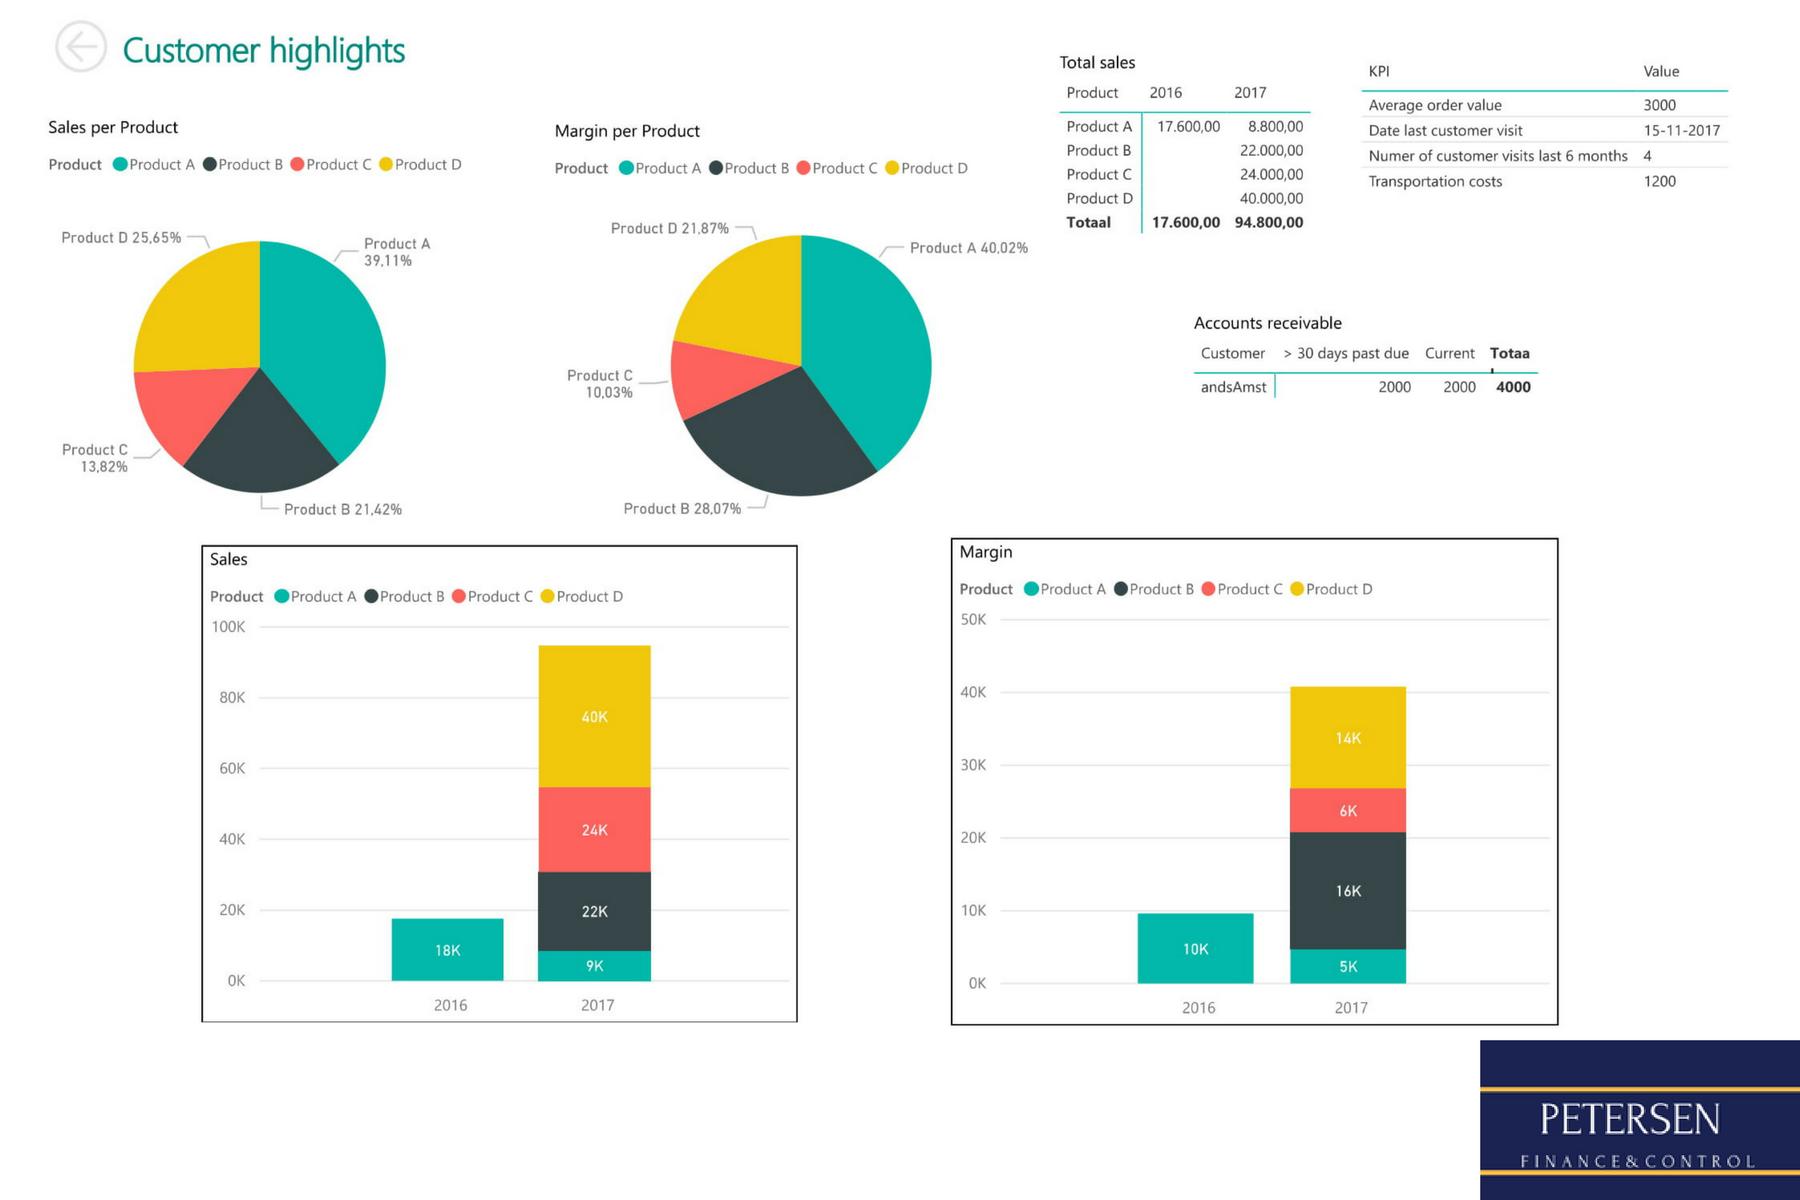 Power BI dashboard Petersen Finance & Control